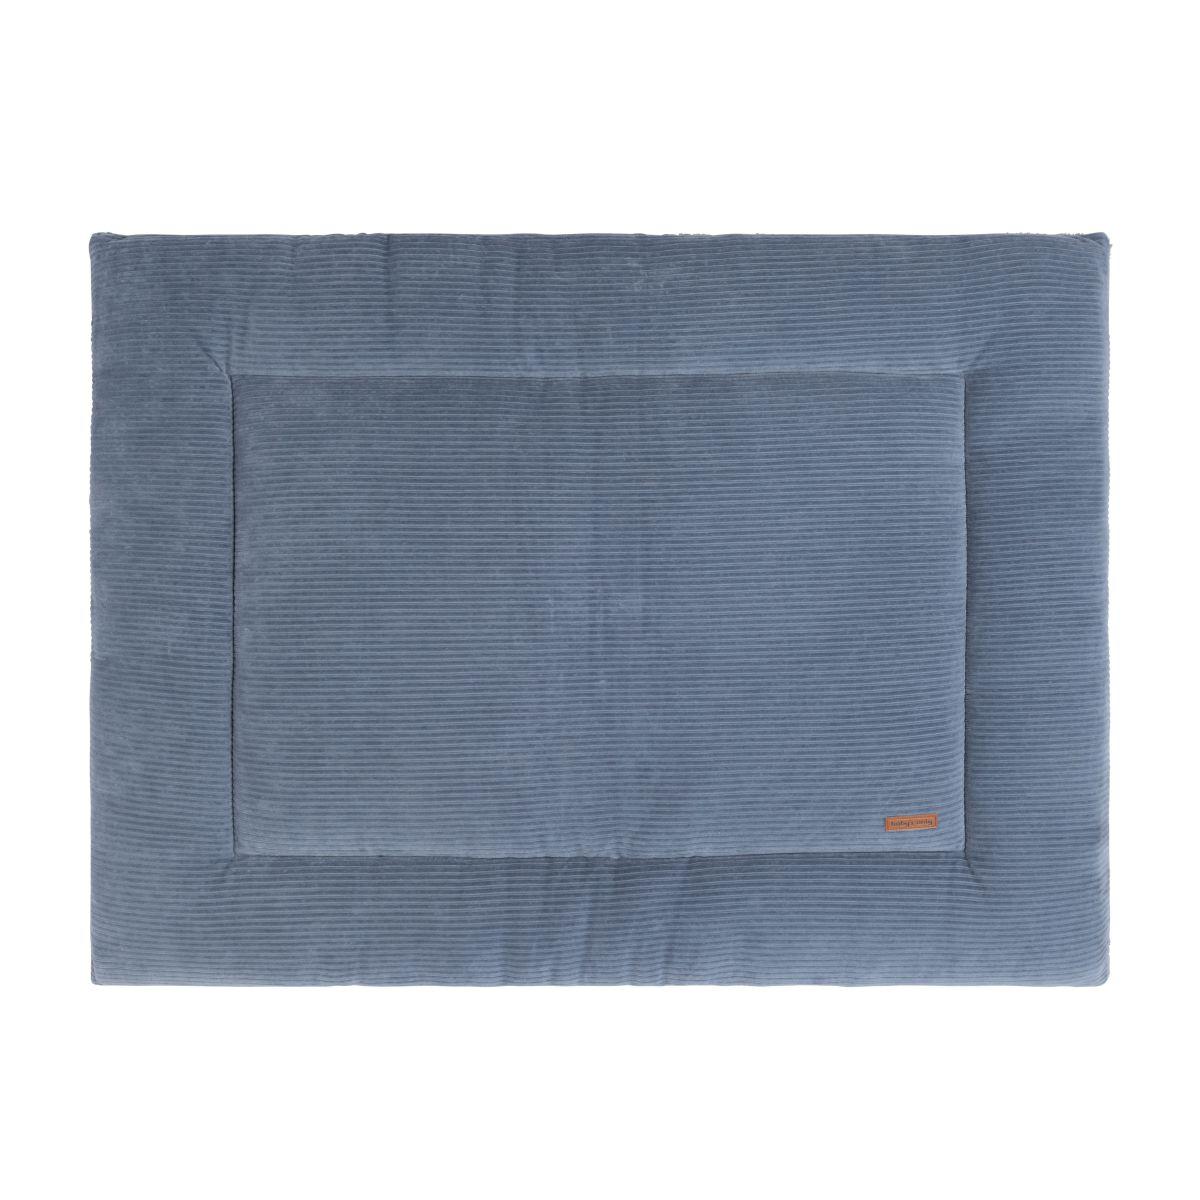 babys only bo02400203851 boxkleed 80x100 cm sense vintage blue 1